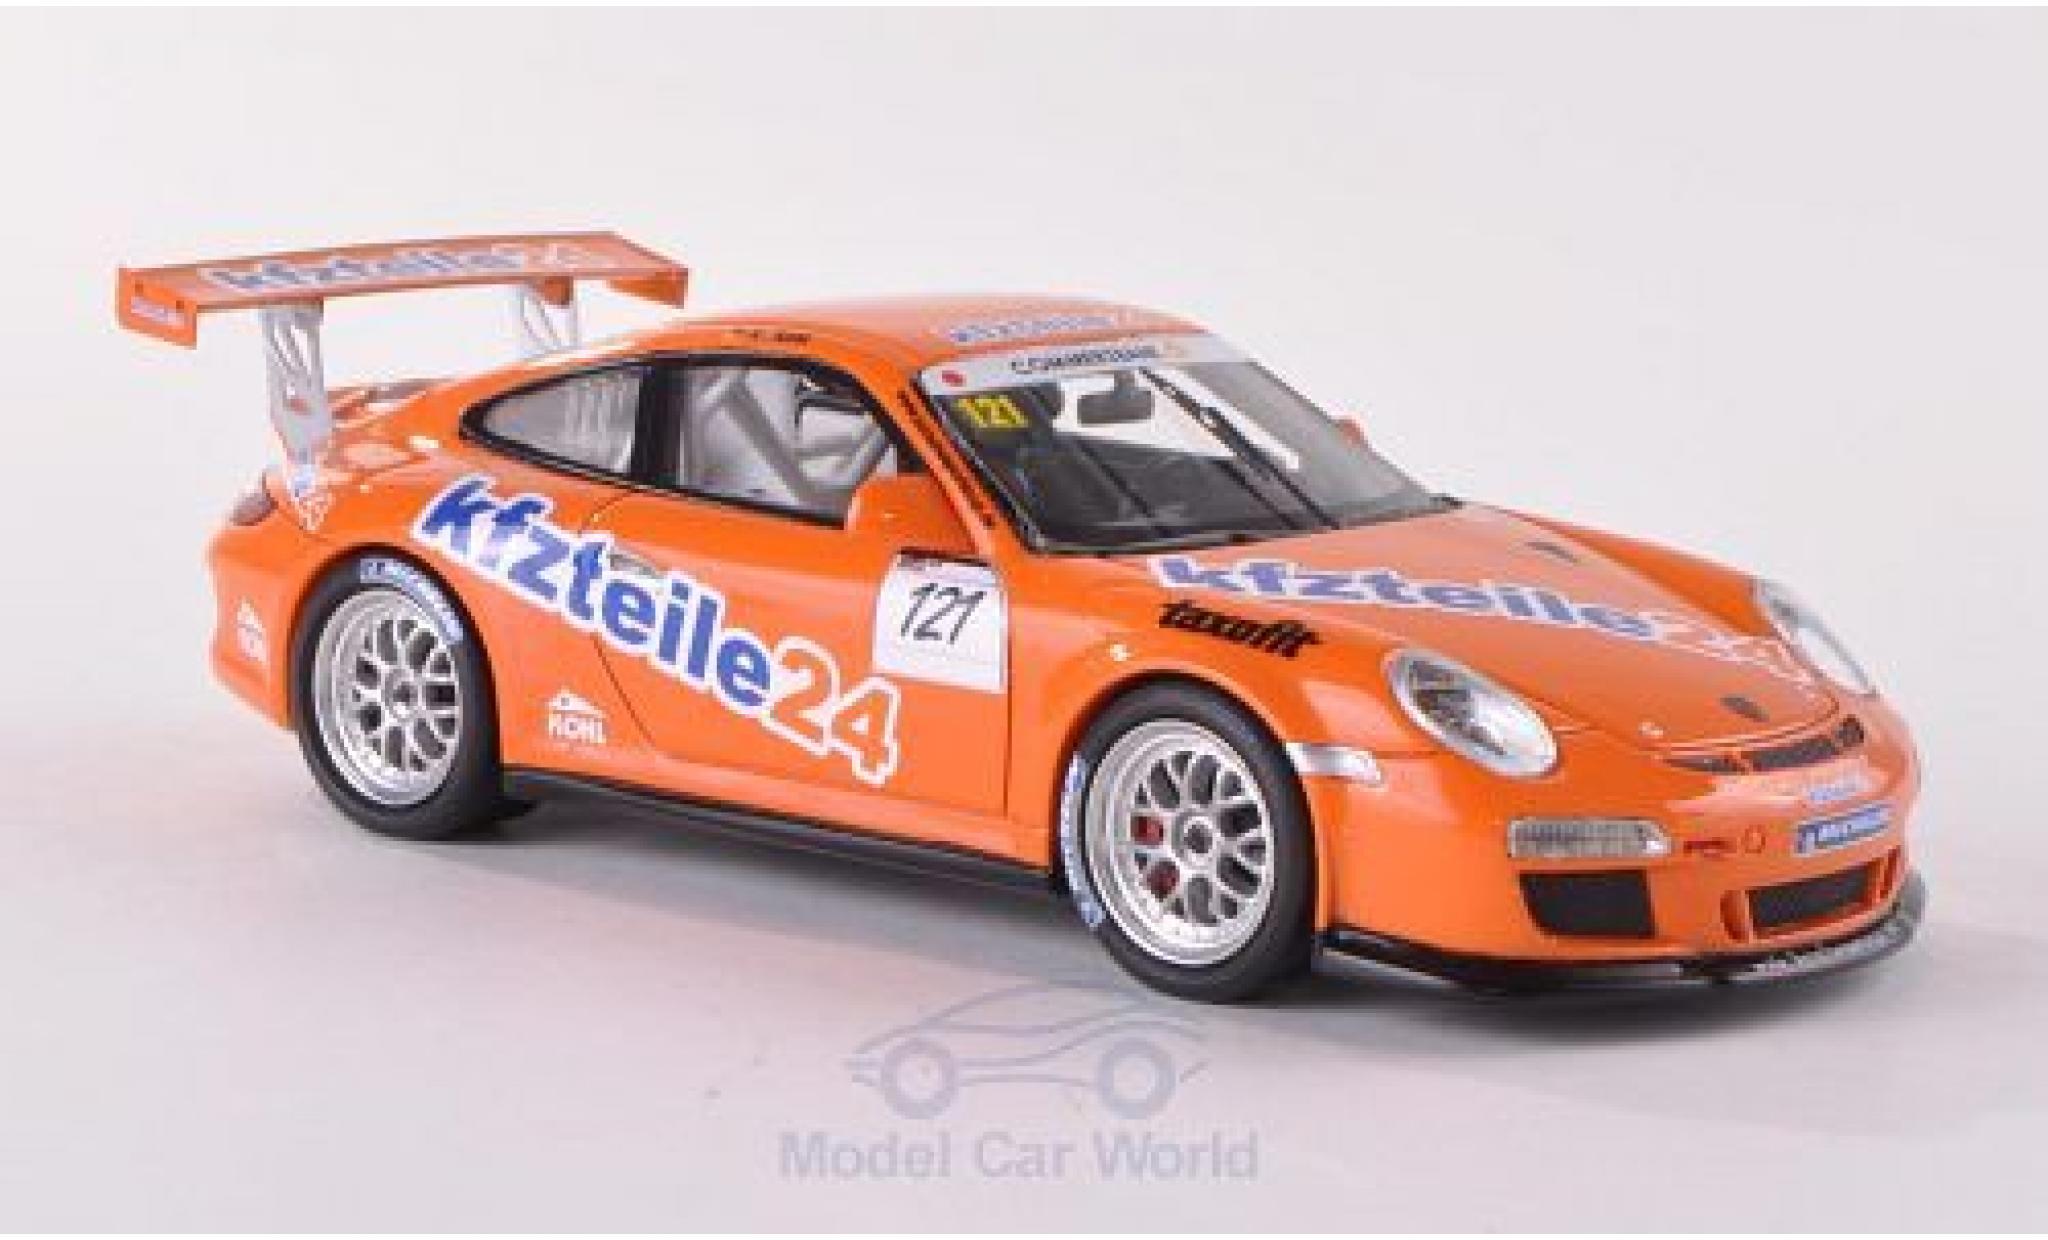 Porsche 997 SC 1/43 Schuco ProR (997) GT3 Cup No.121 MS Racing Kfzteile24 Cup A.Kohl